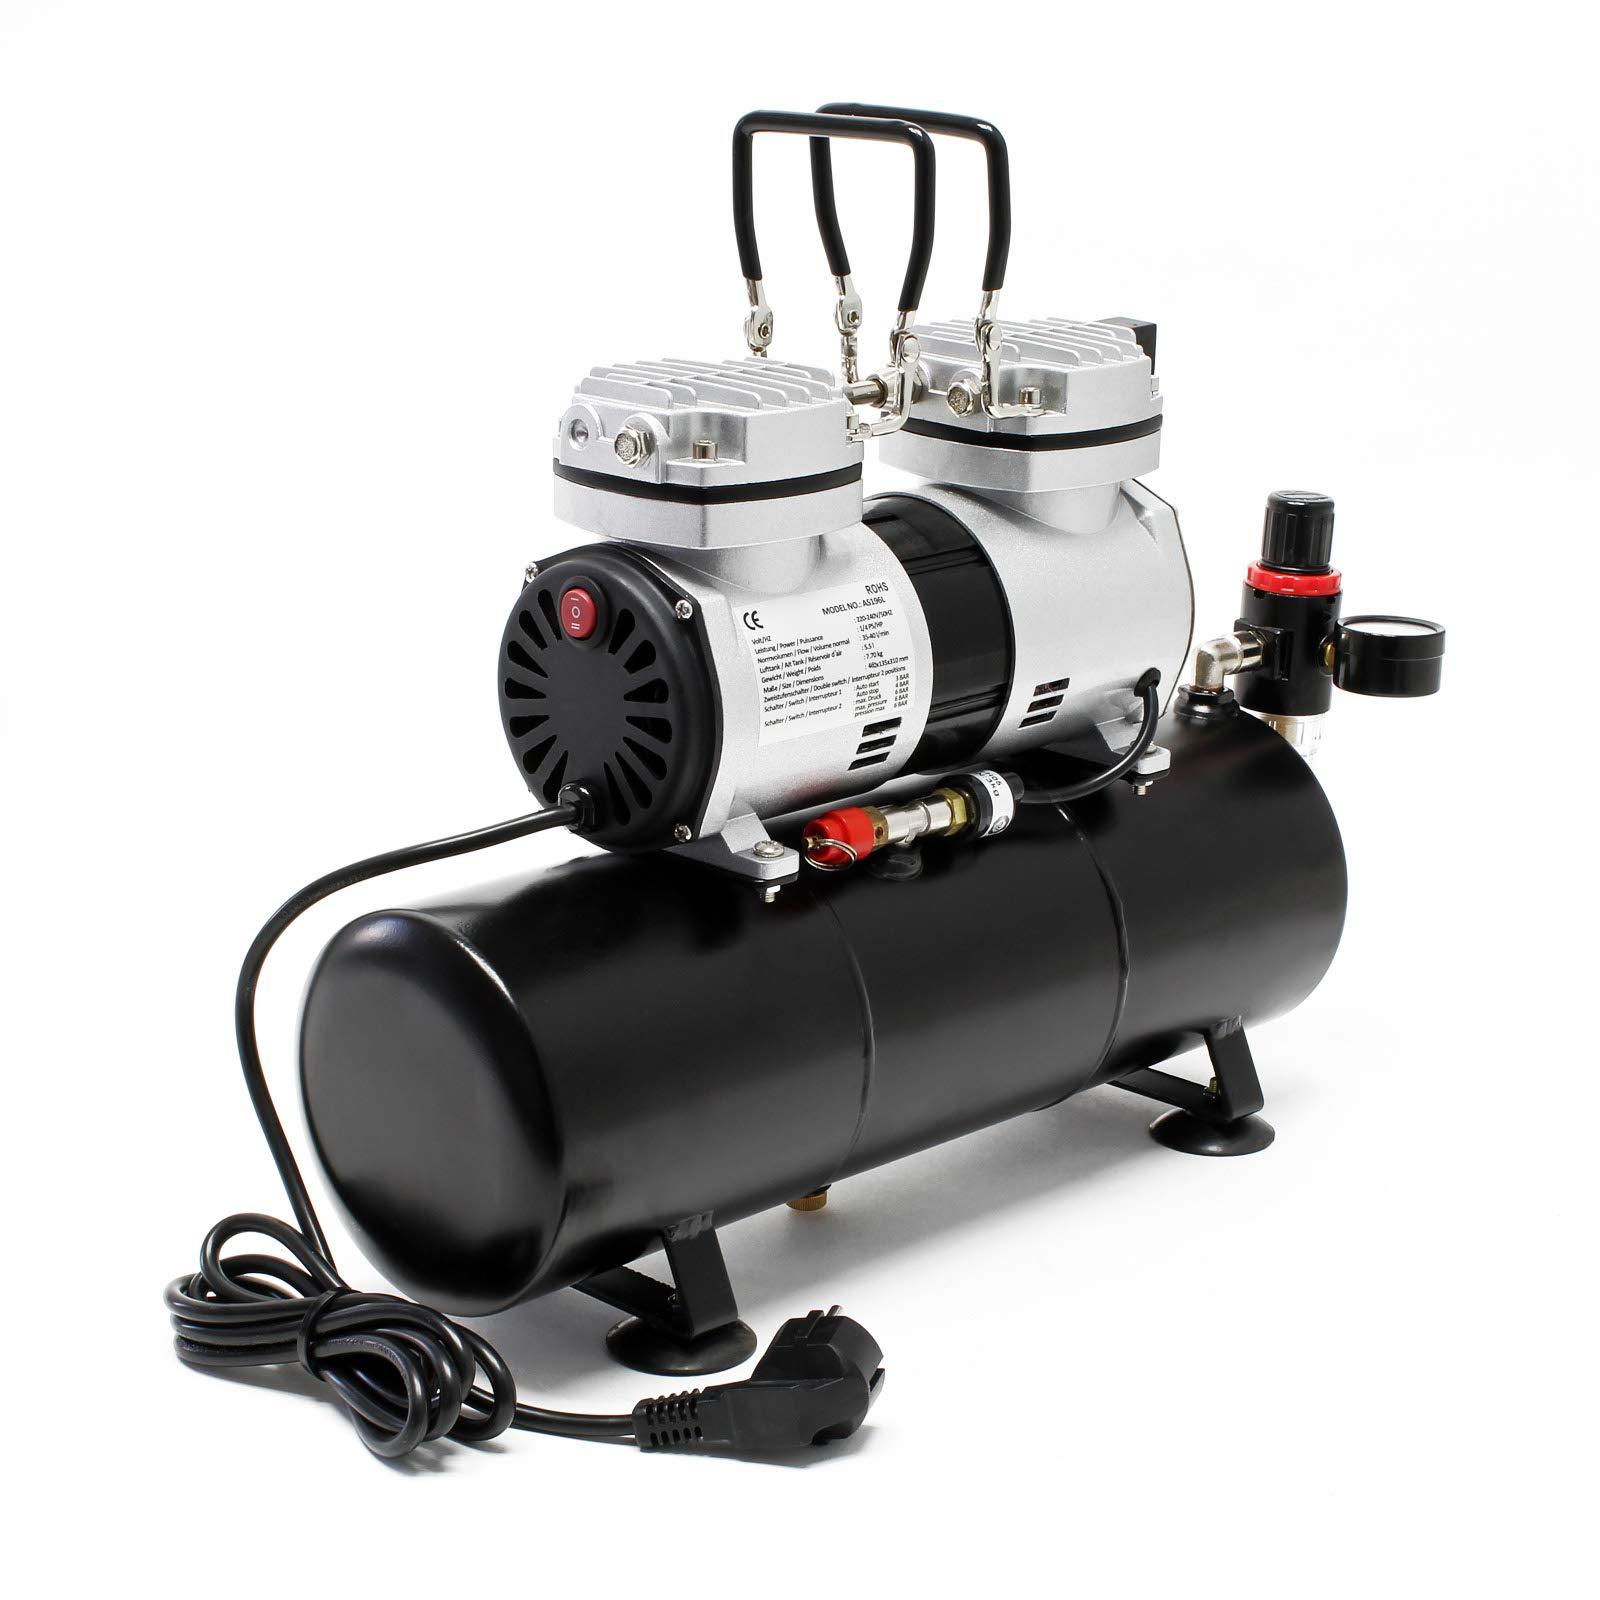 Compresor aerograf/ía HS-196L Tanque aire Regulador presi/ón OnOff autom/áticos Aer/ógrafo Modelismo